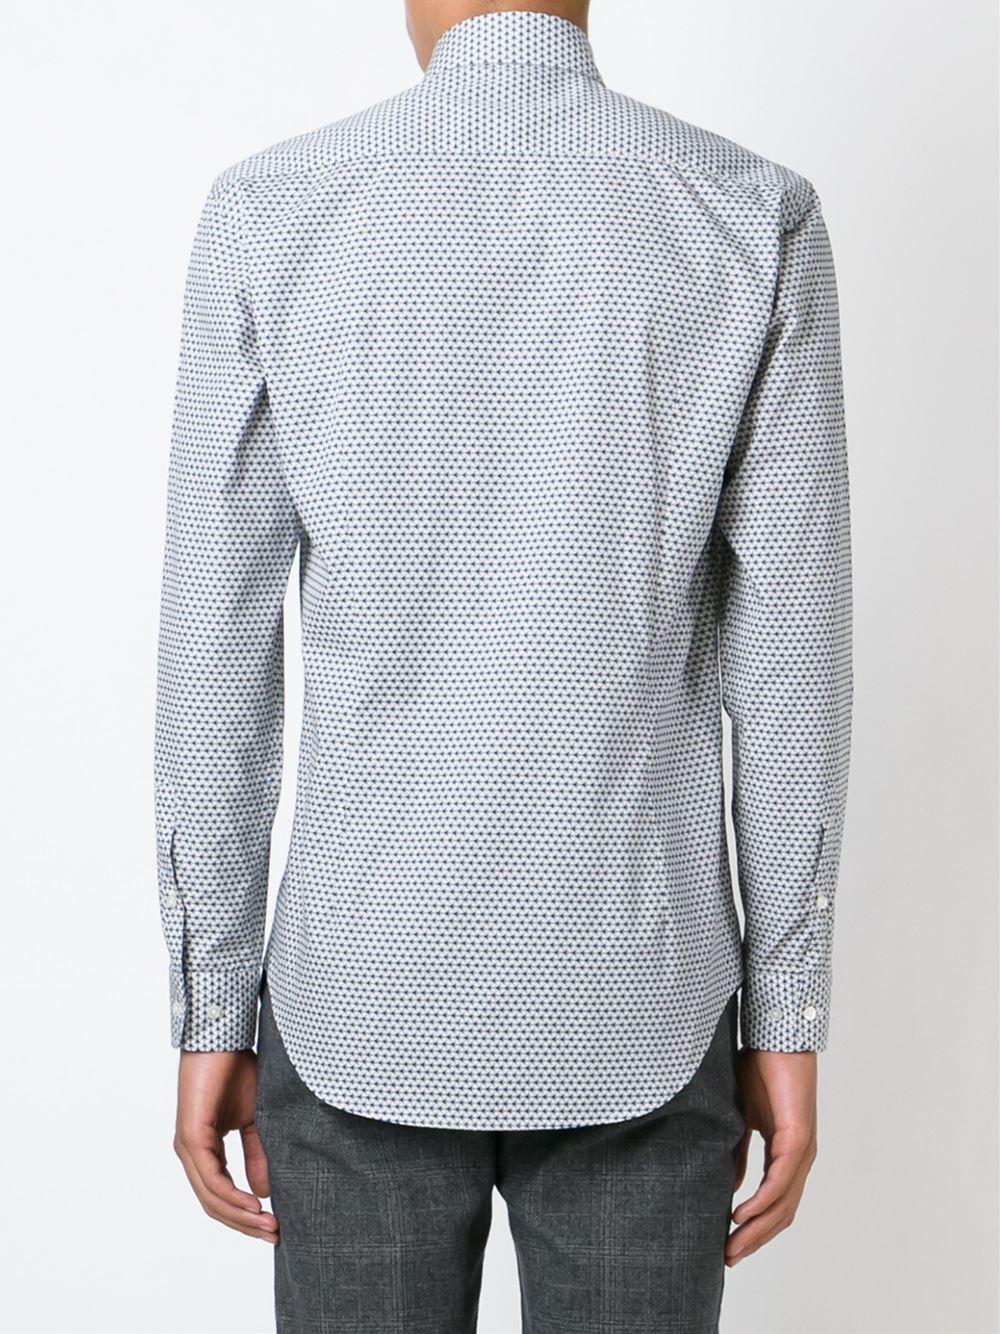 Etro geometric print shirt in white for men lyst for Etro men s shirts